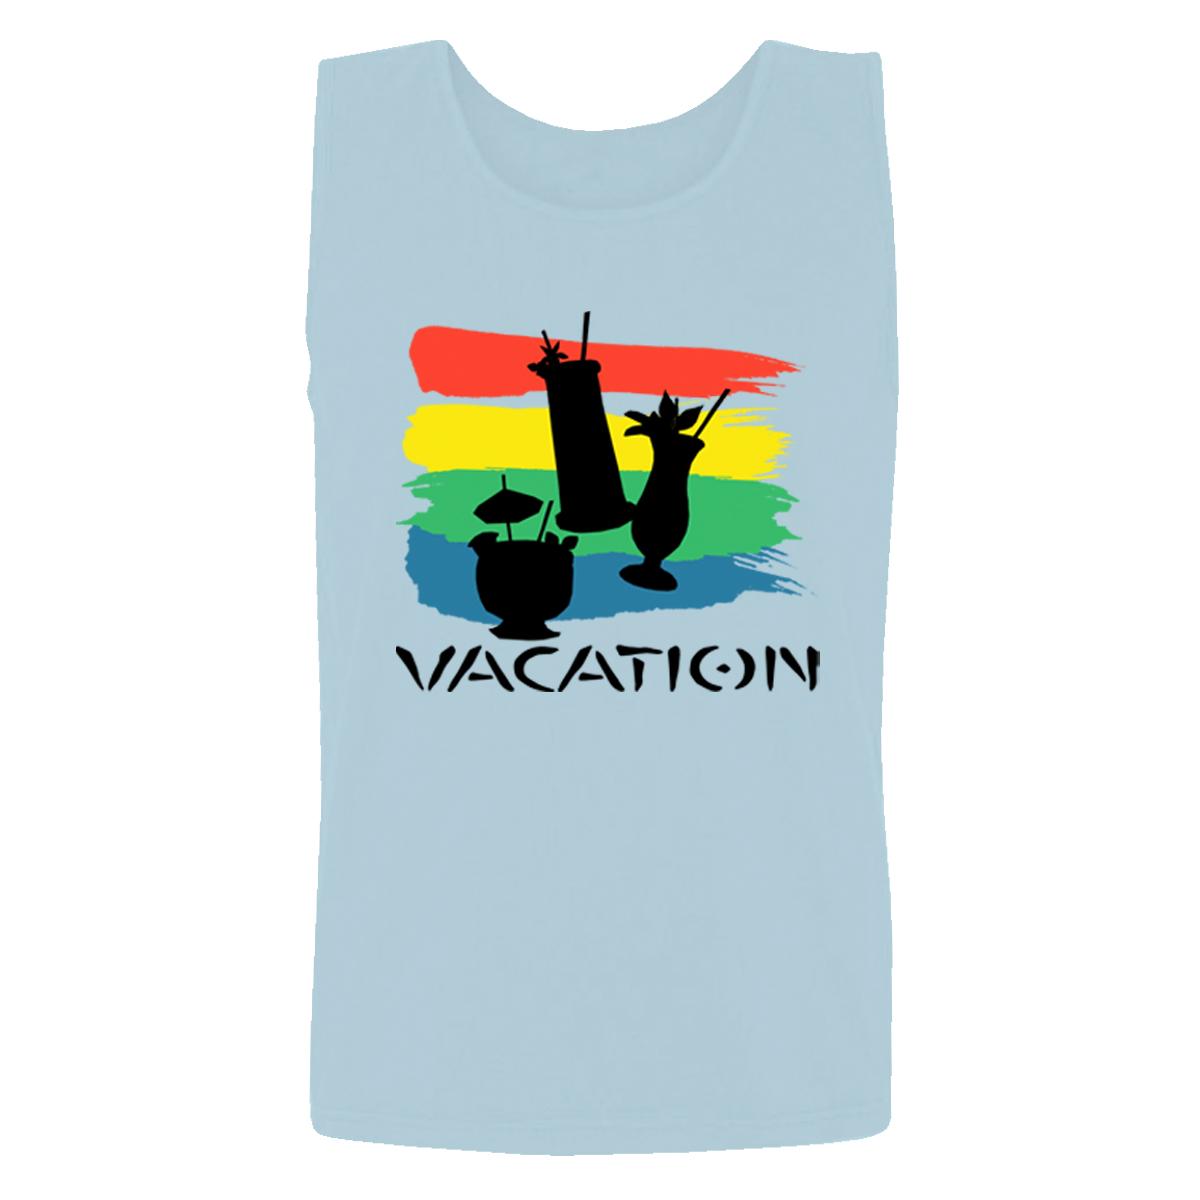 Vacation Drinks Tank